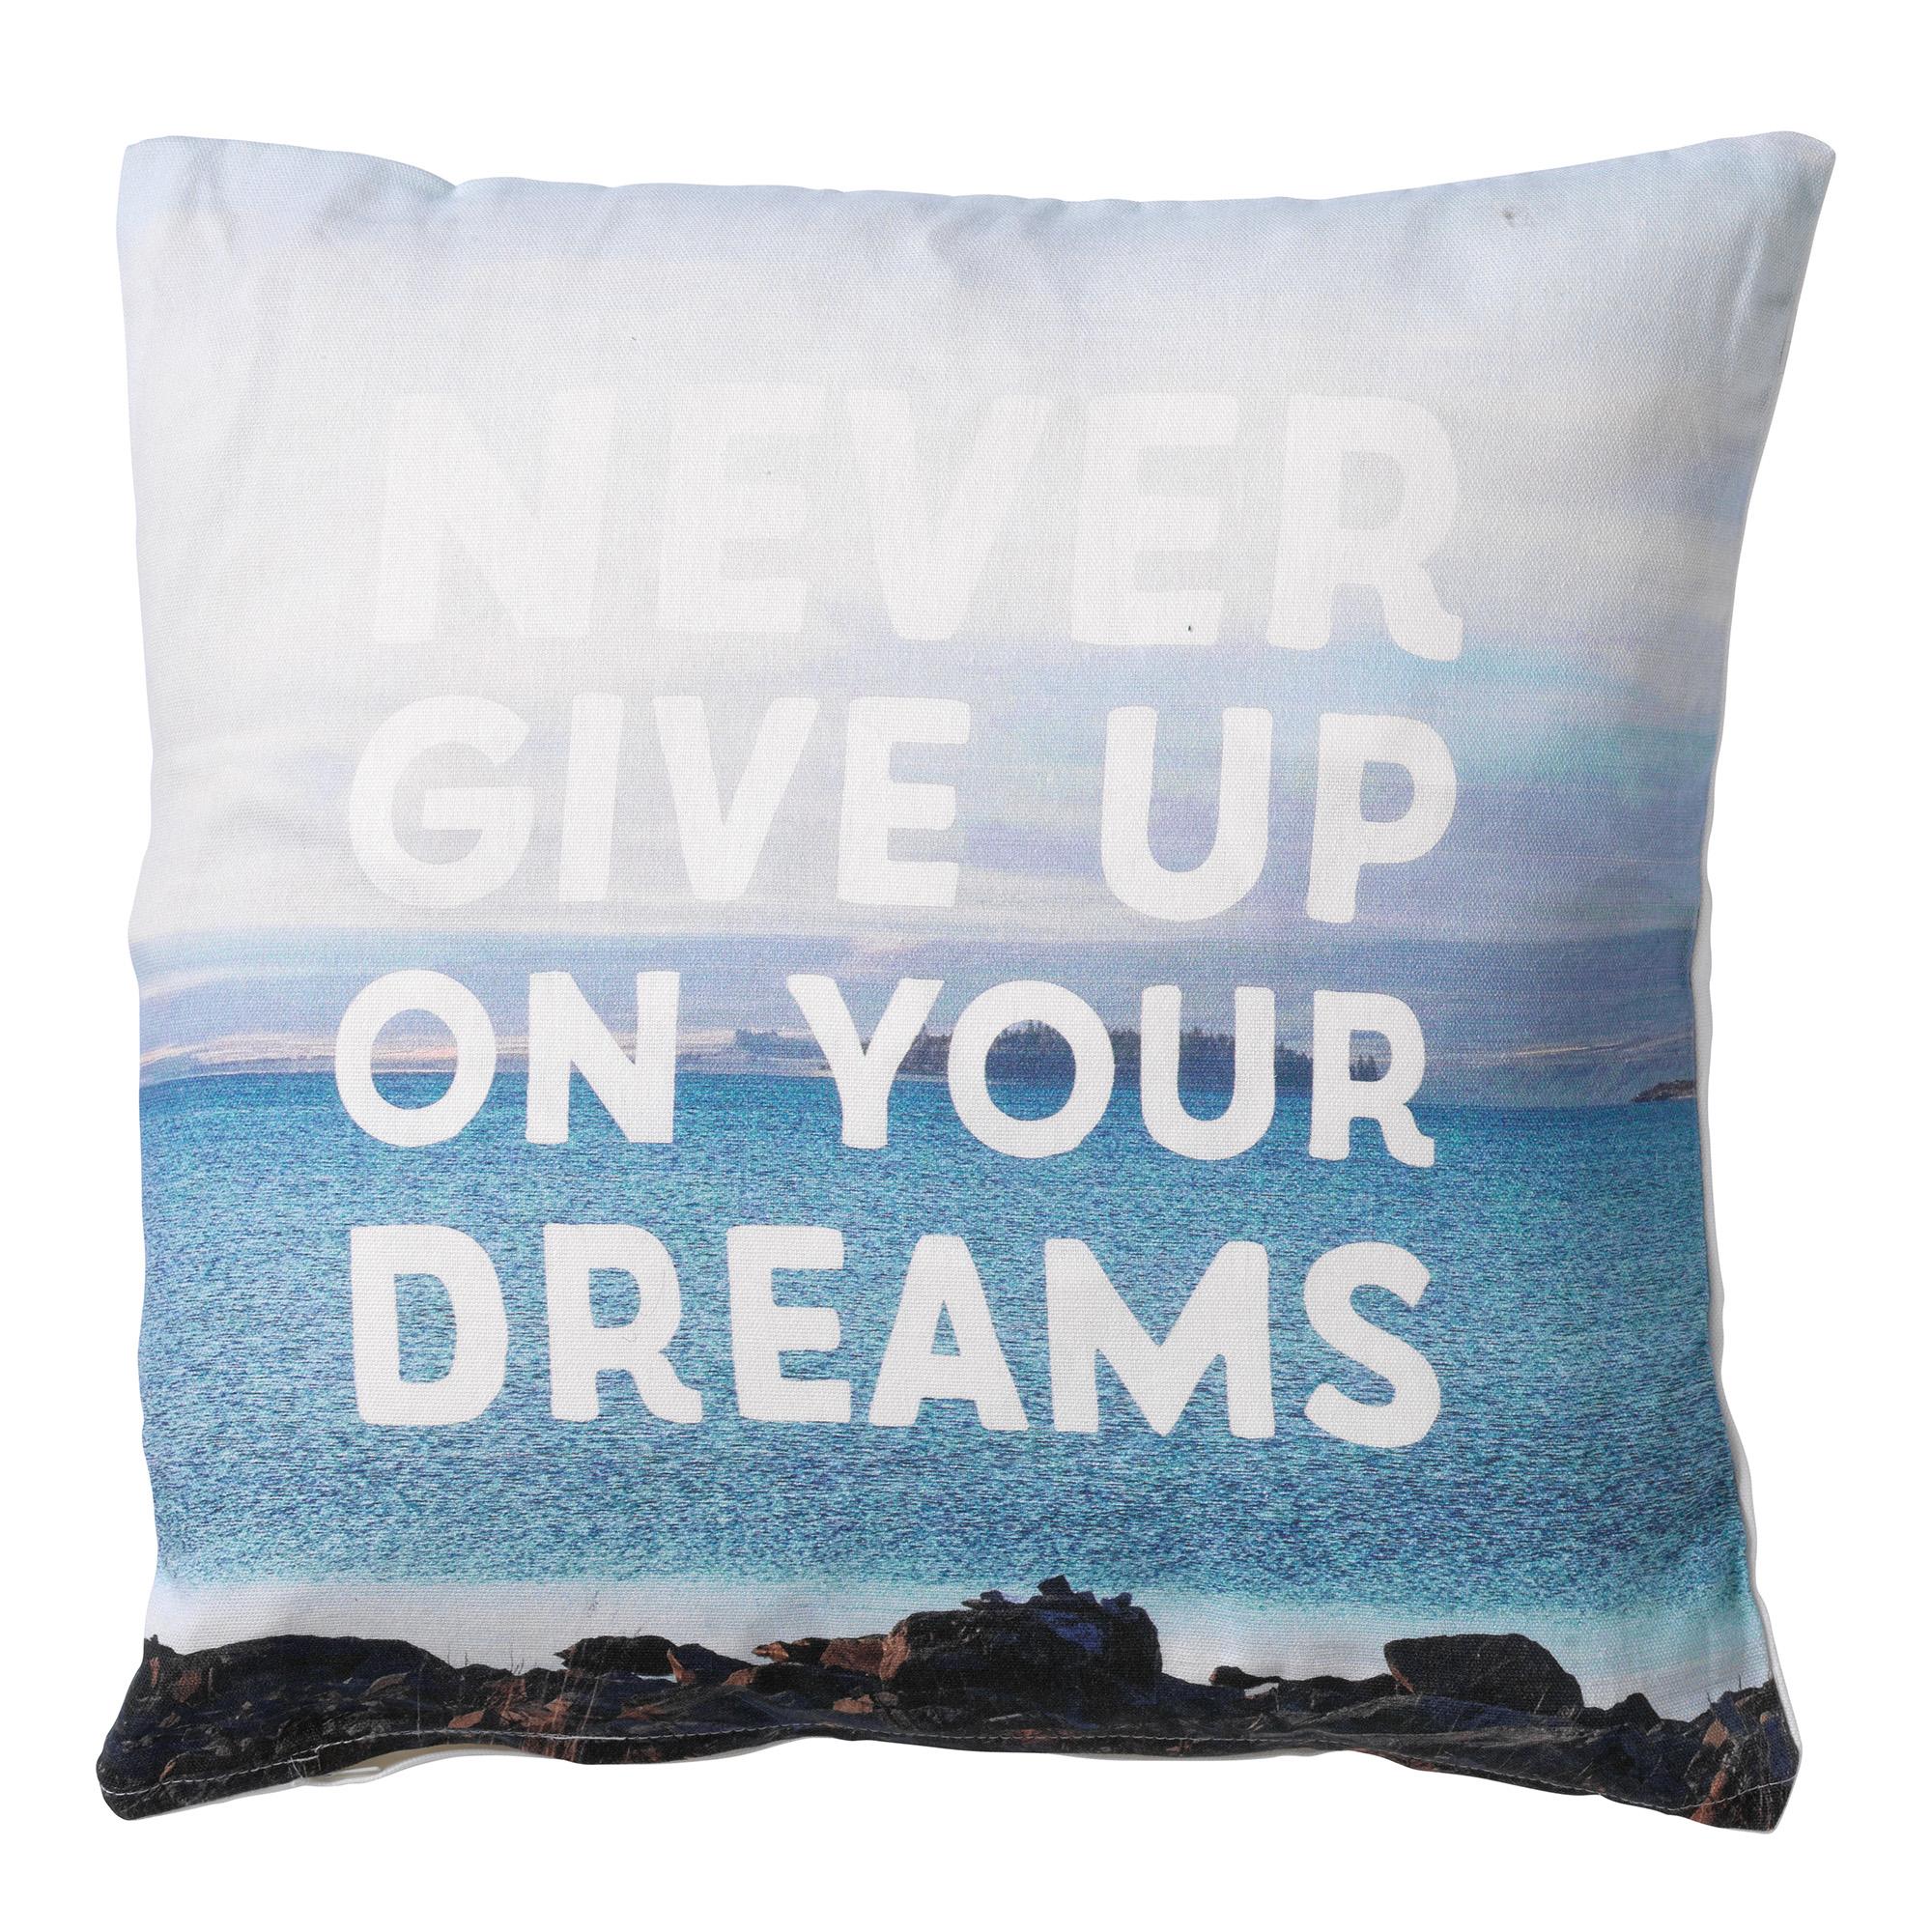 DREAMS - Sierkussen  met tekst blauw en wit 45x45 cm